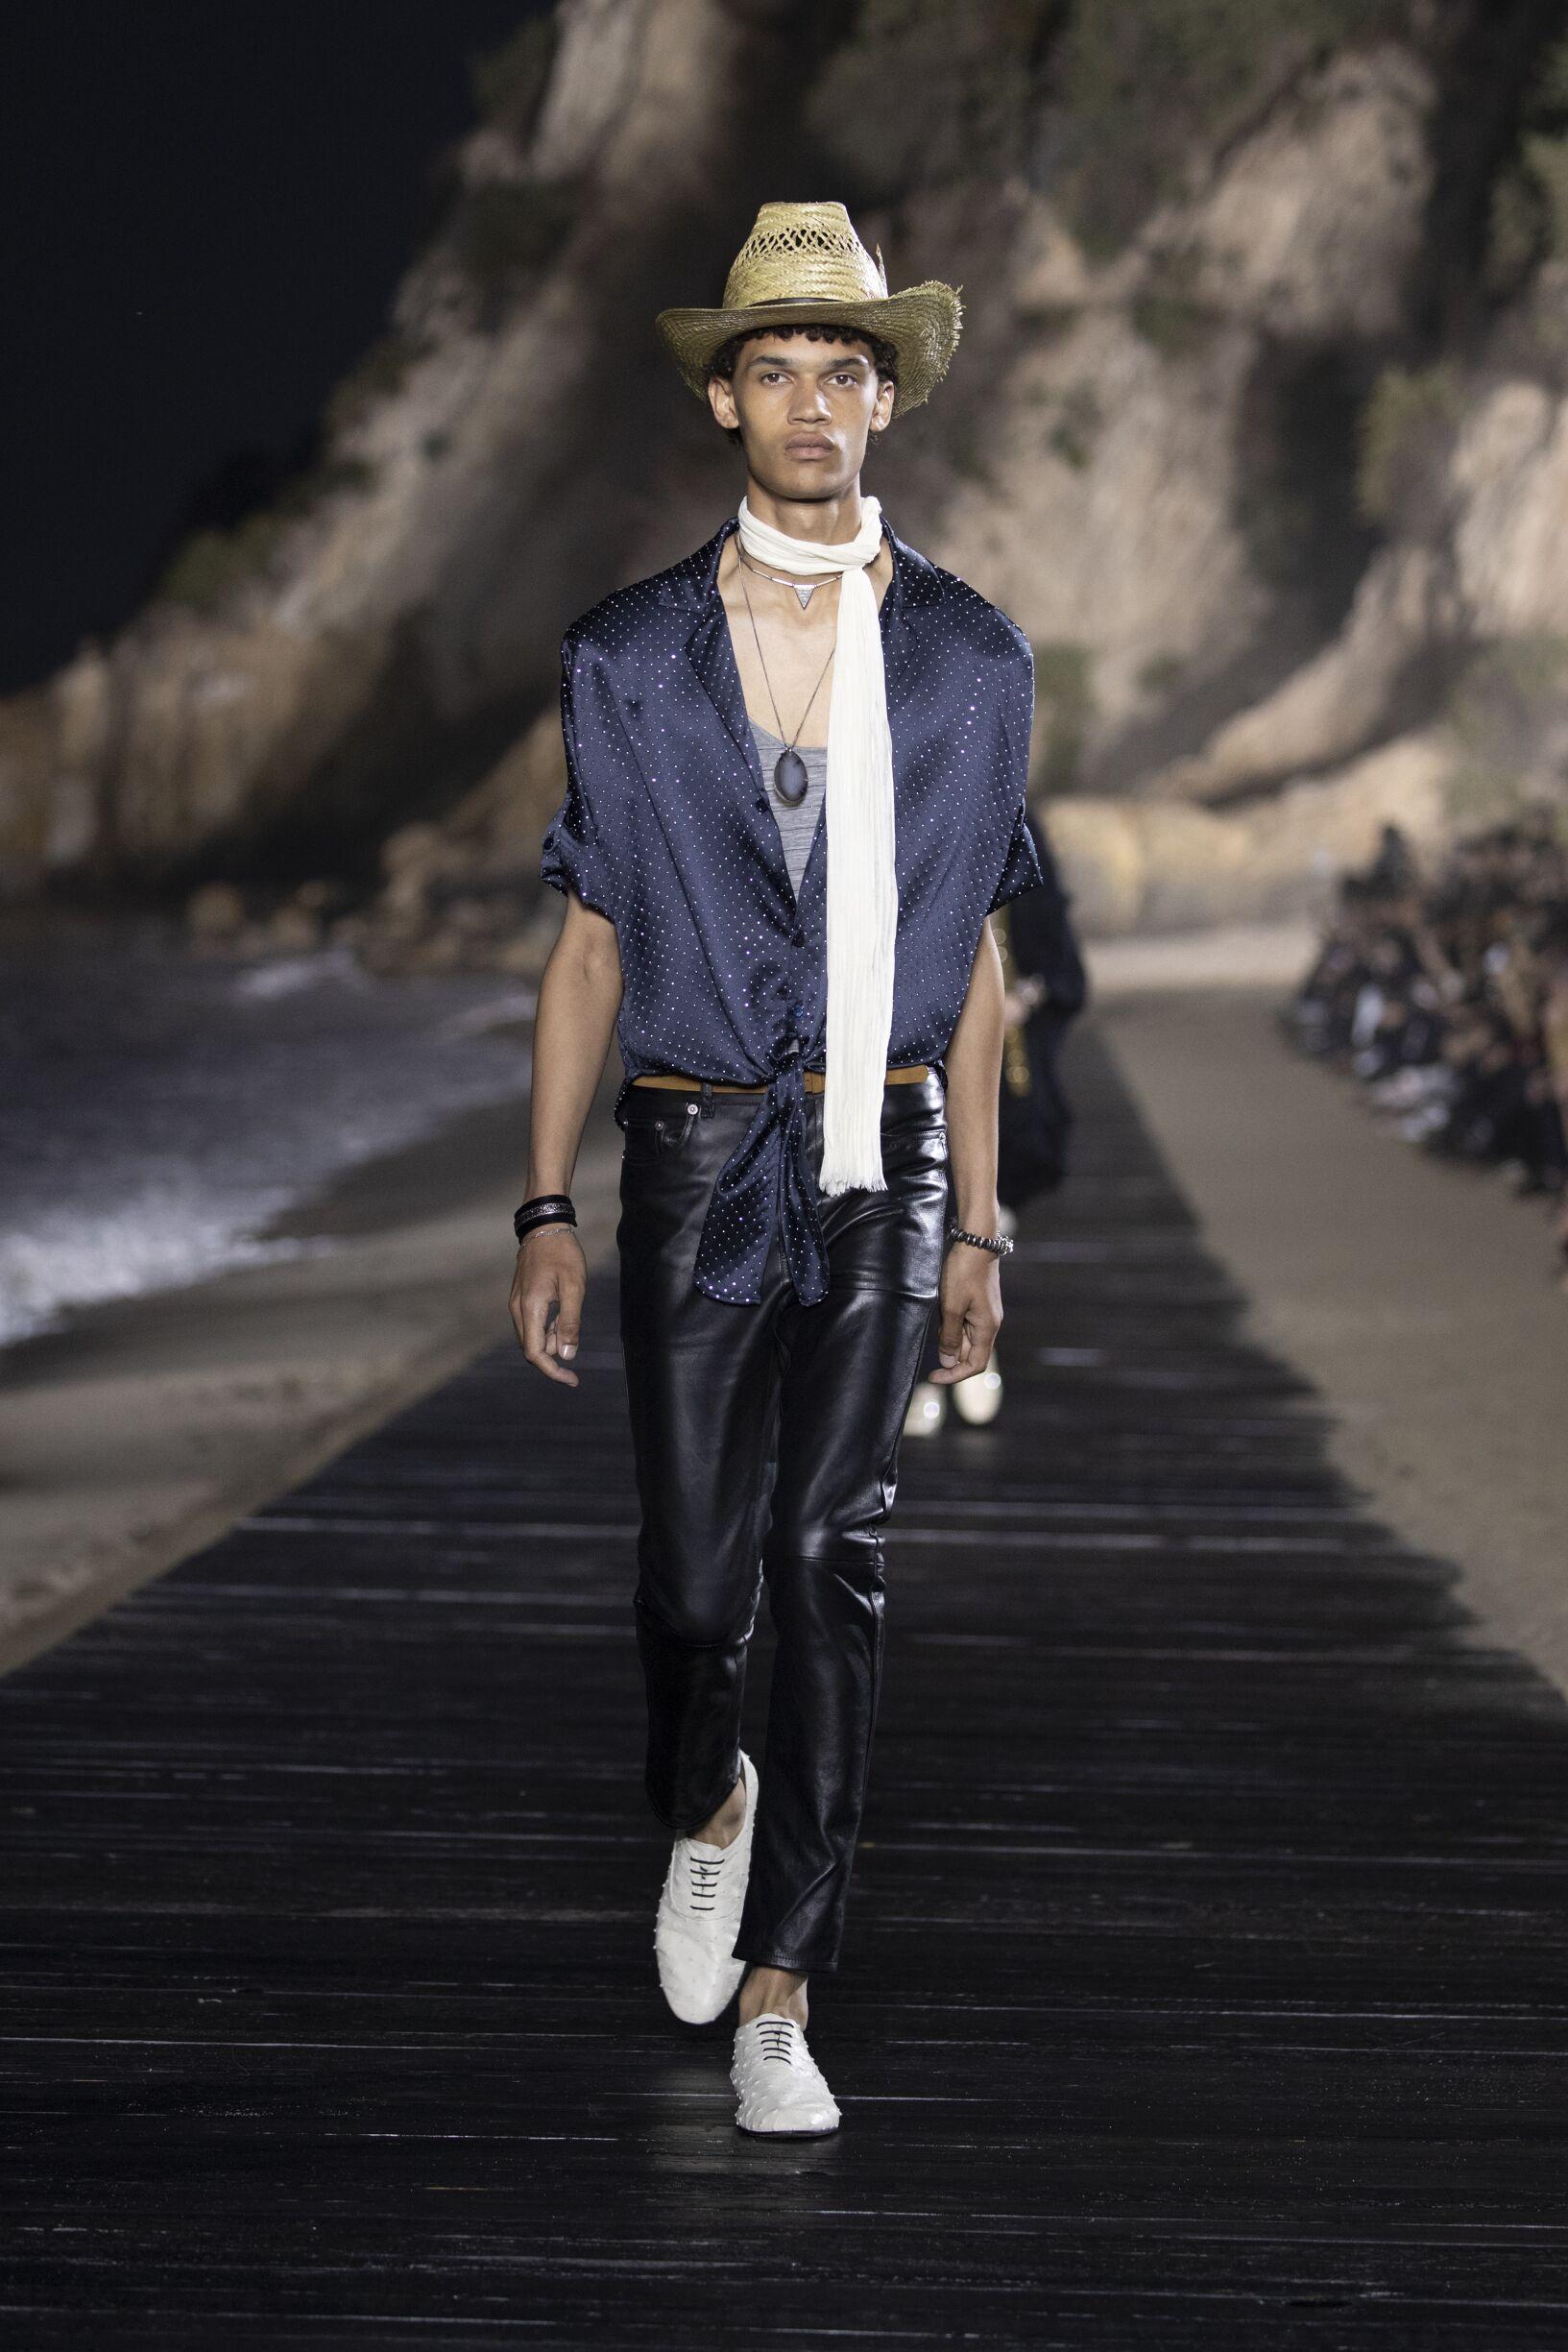 Catwalk Saint Laurent Man Fashion Show Summer 2020